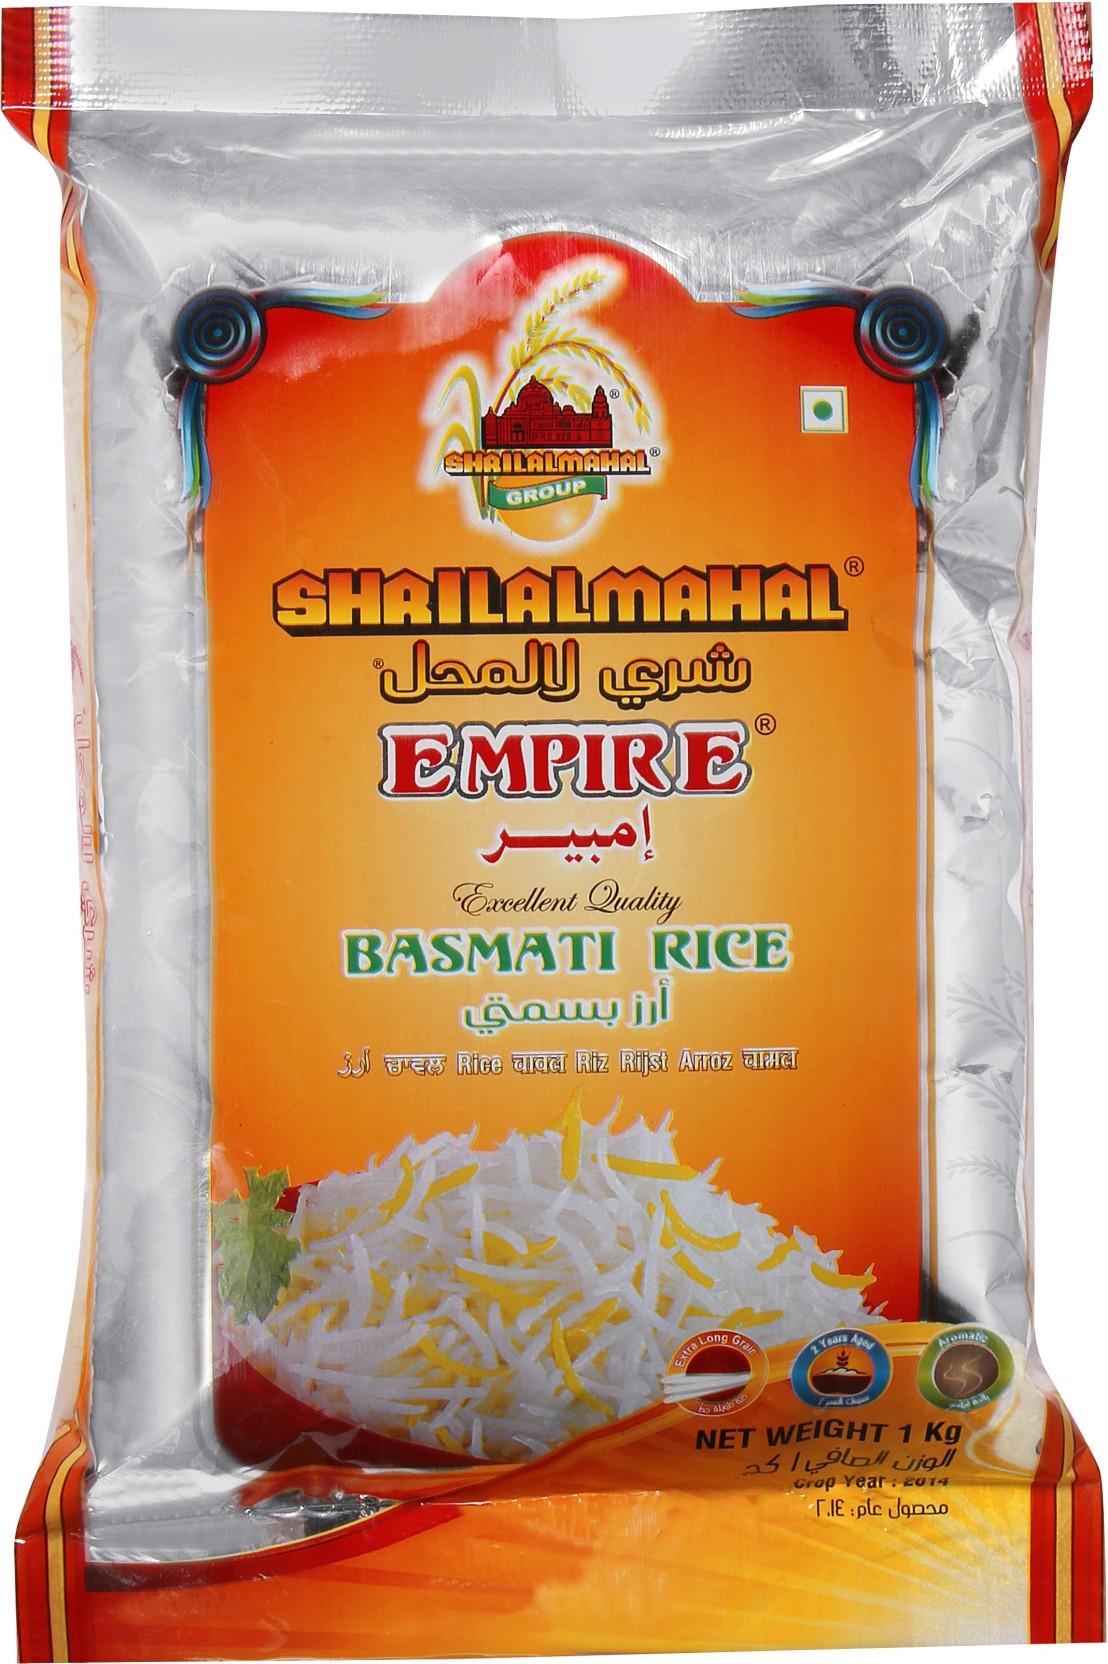 Shri Lal Mahal Empire Basmati Rice Box 10 X 1 Kg Pure Green Organic Long Grain Share